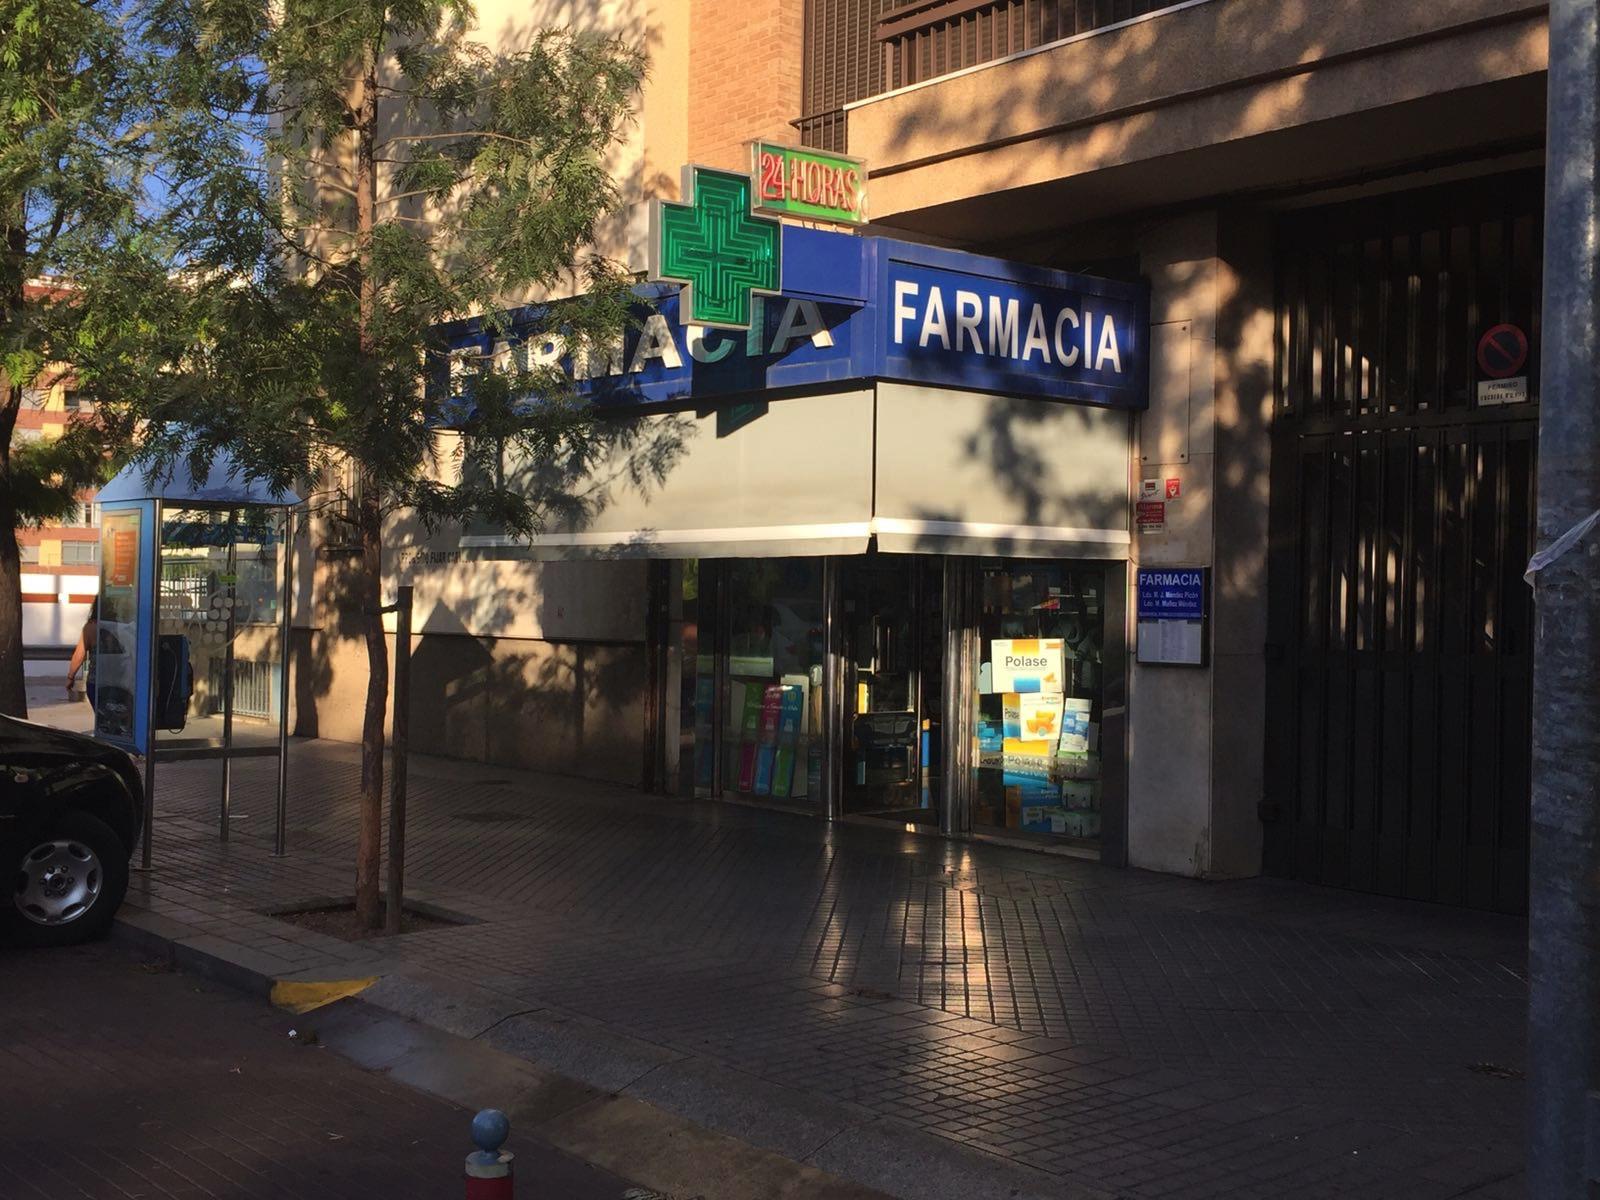 Farmacia de la Avenida de América en Córdoba